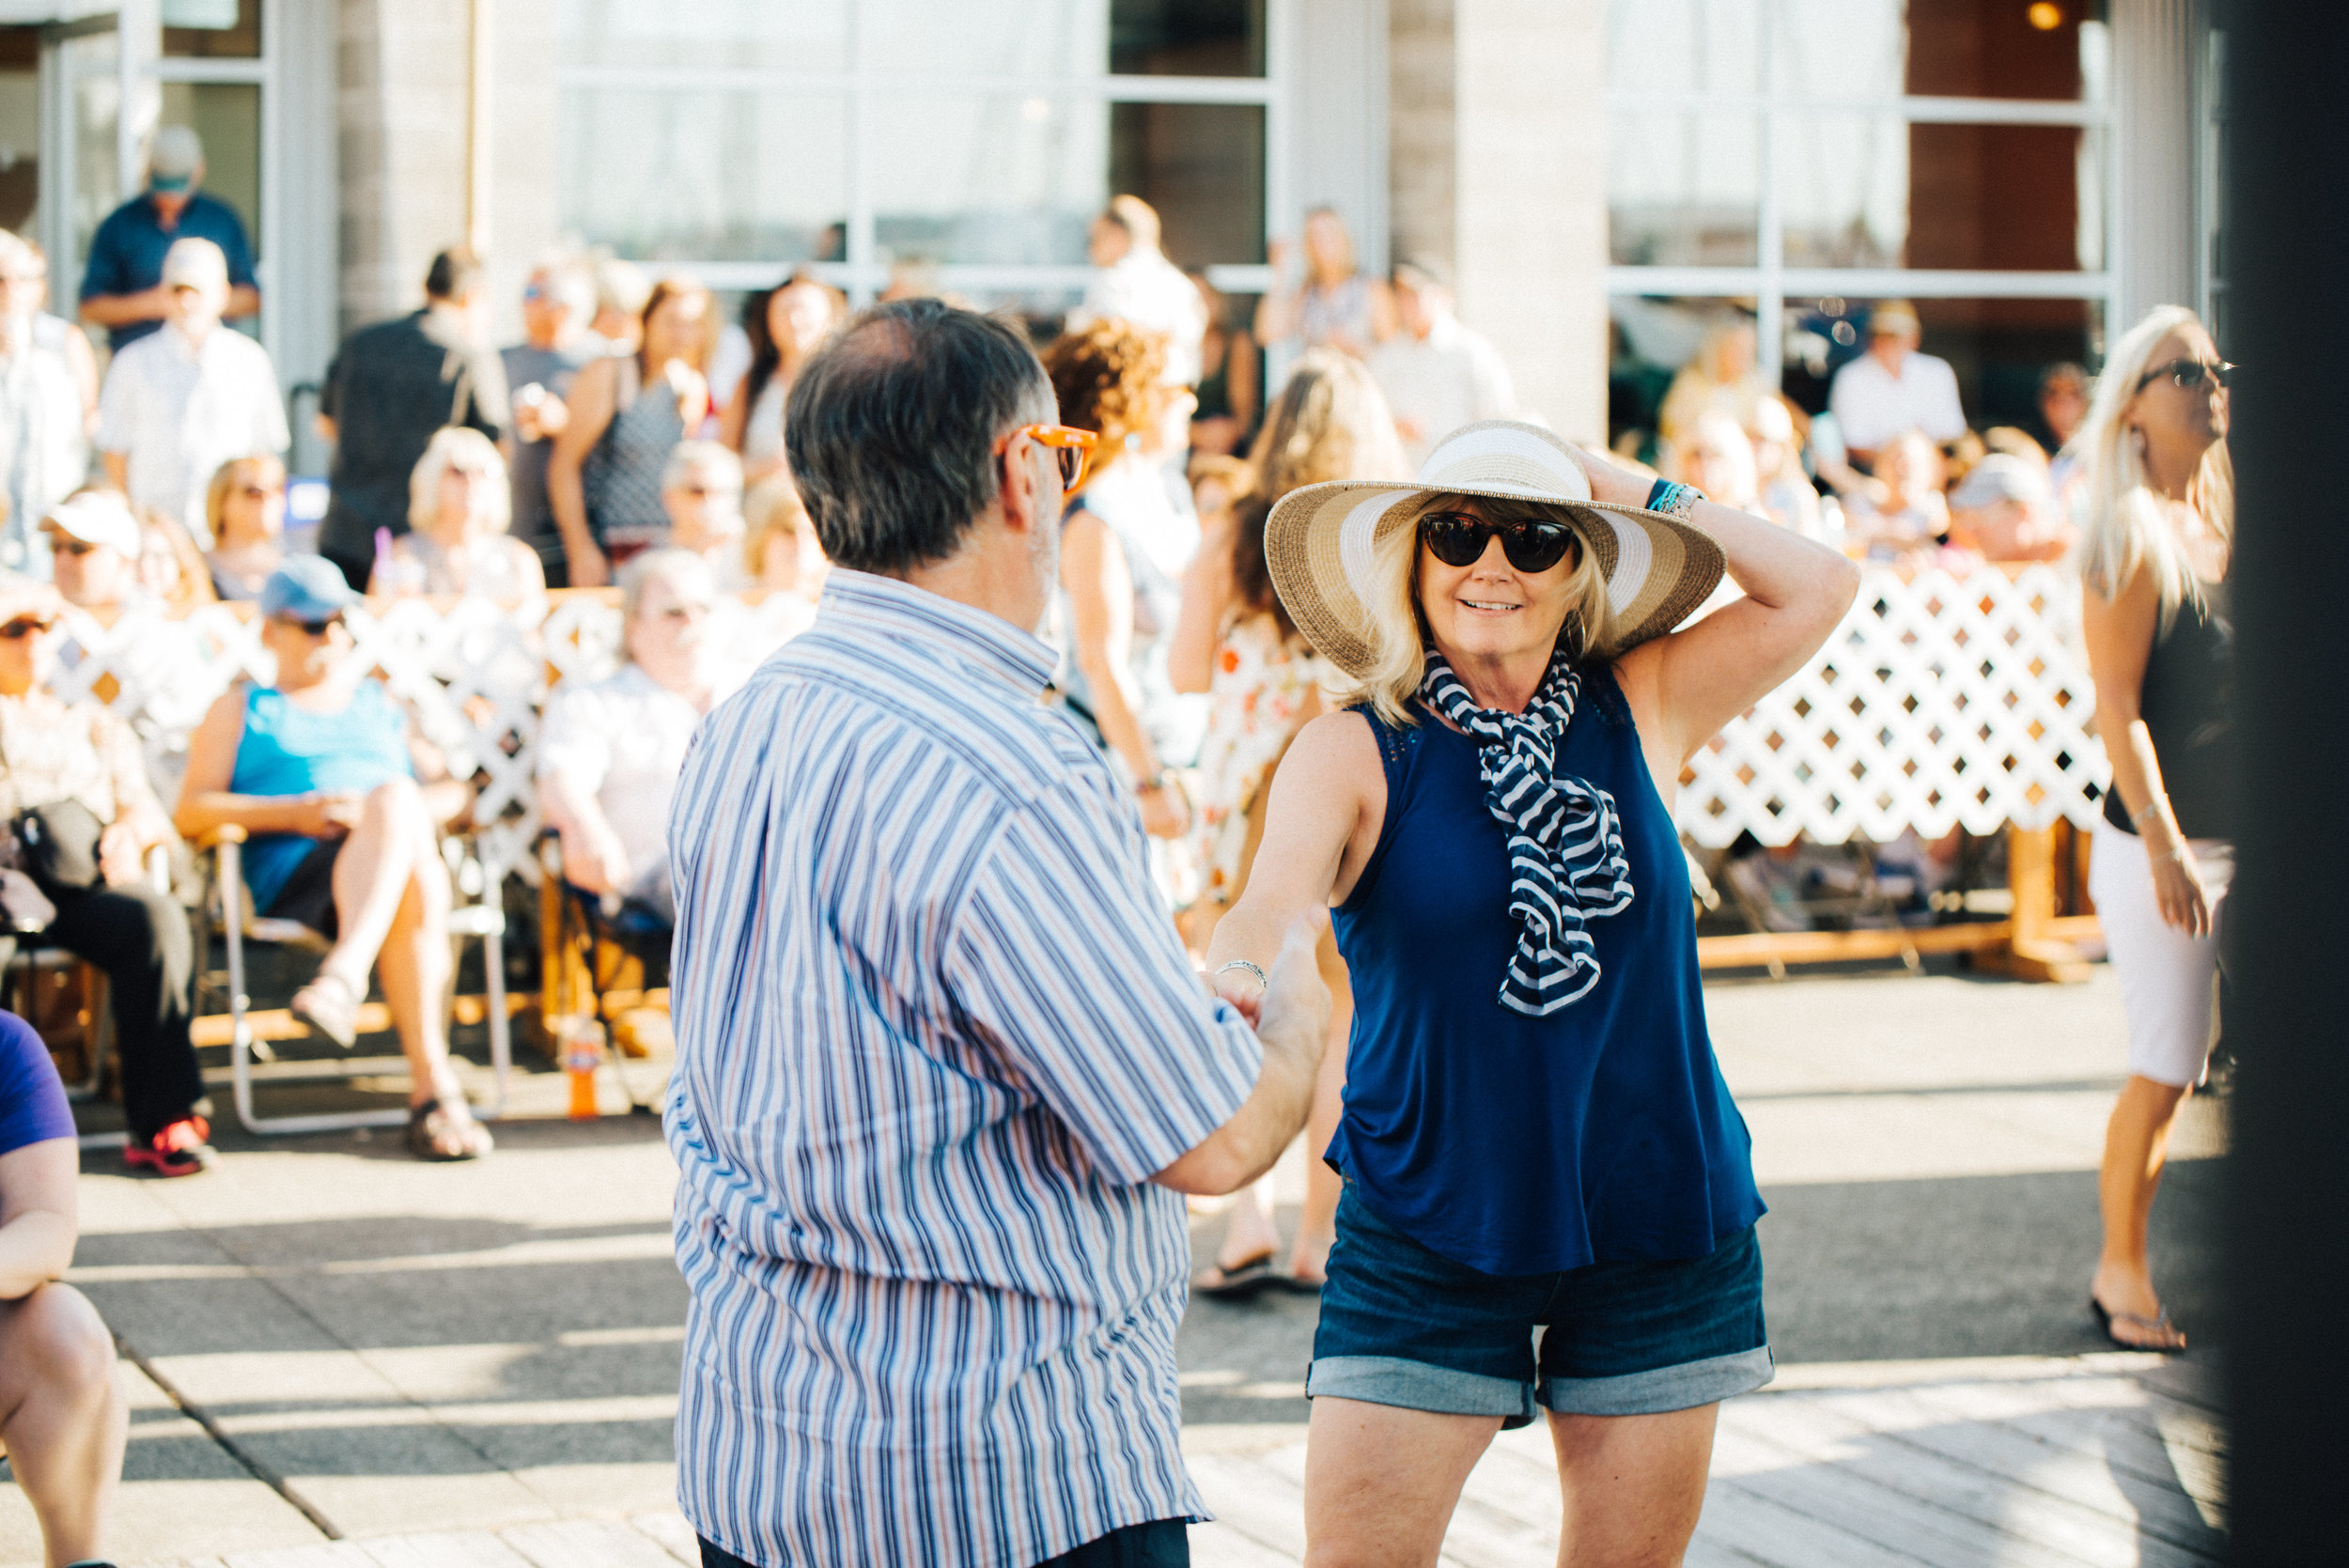 Dancers at Music at the Marina // Courtesy of Jake Campbell